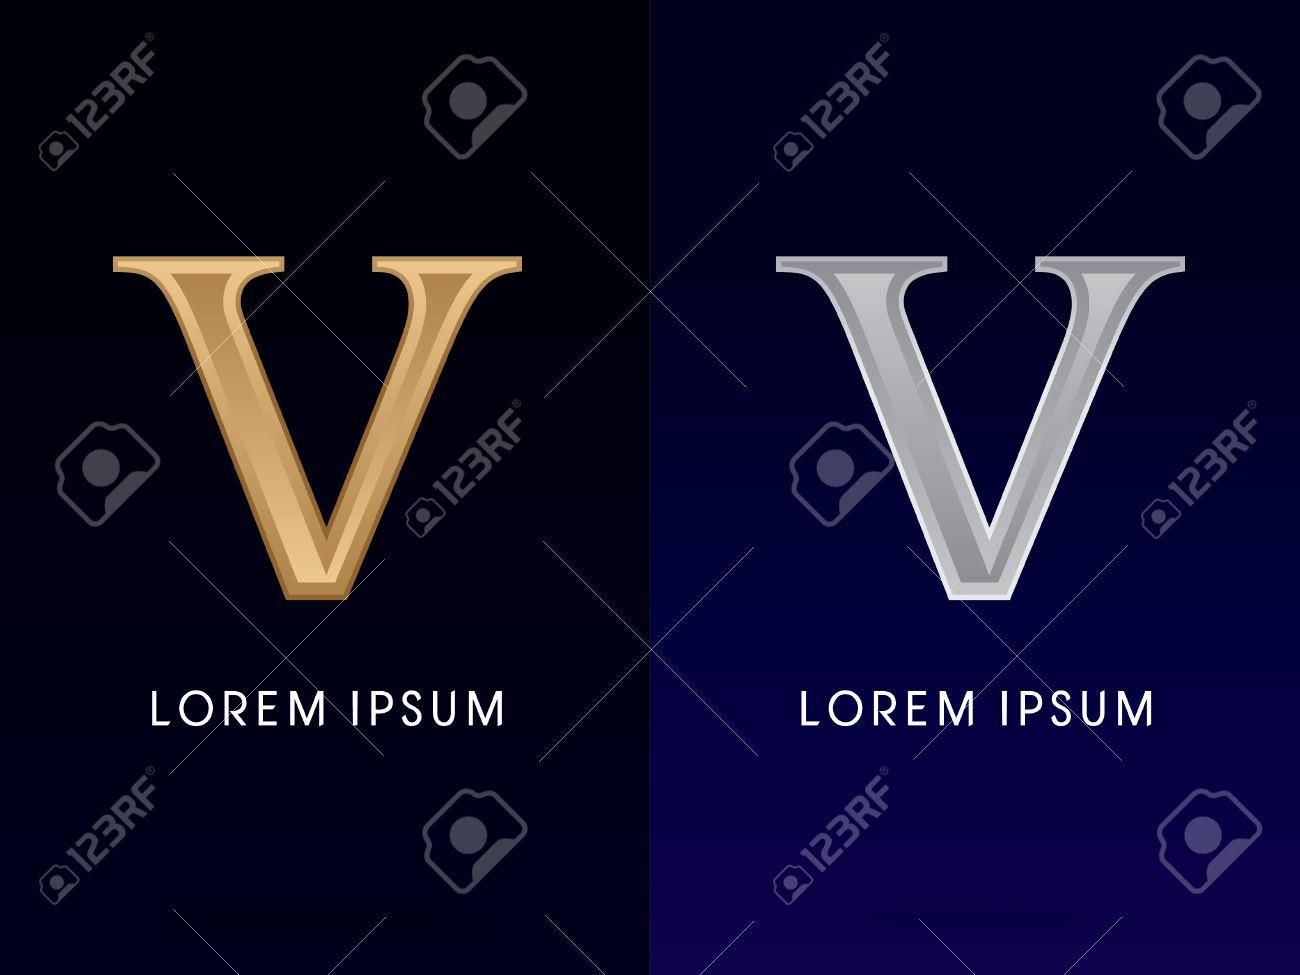 worksheet V Roman Numeral 5 v luxury gold and silver roman numerals sign logo symbol symbol